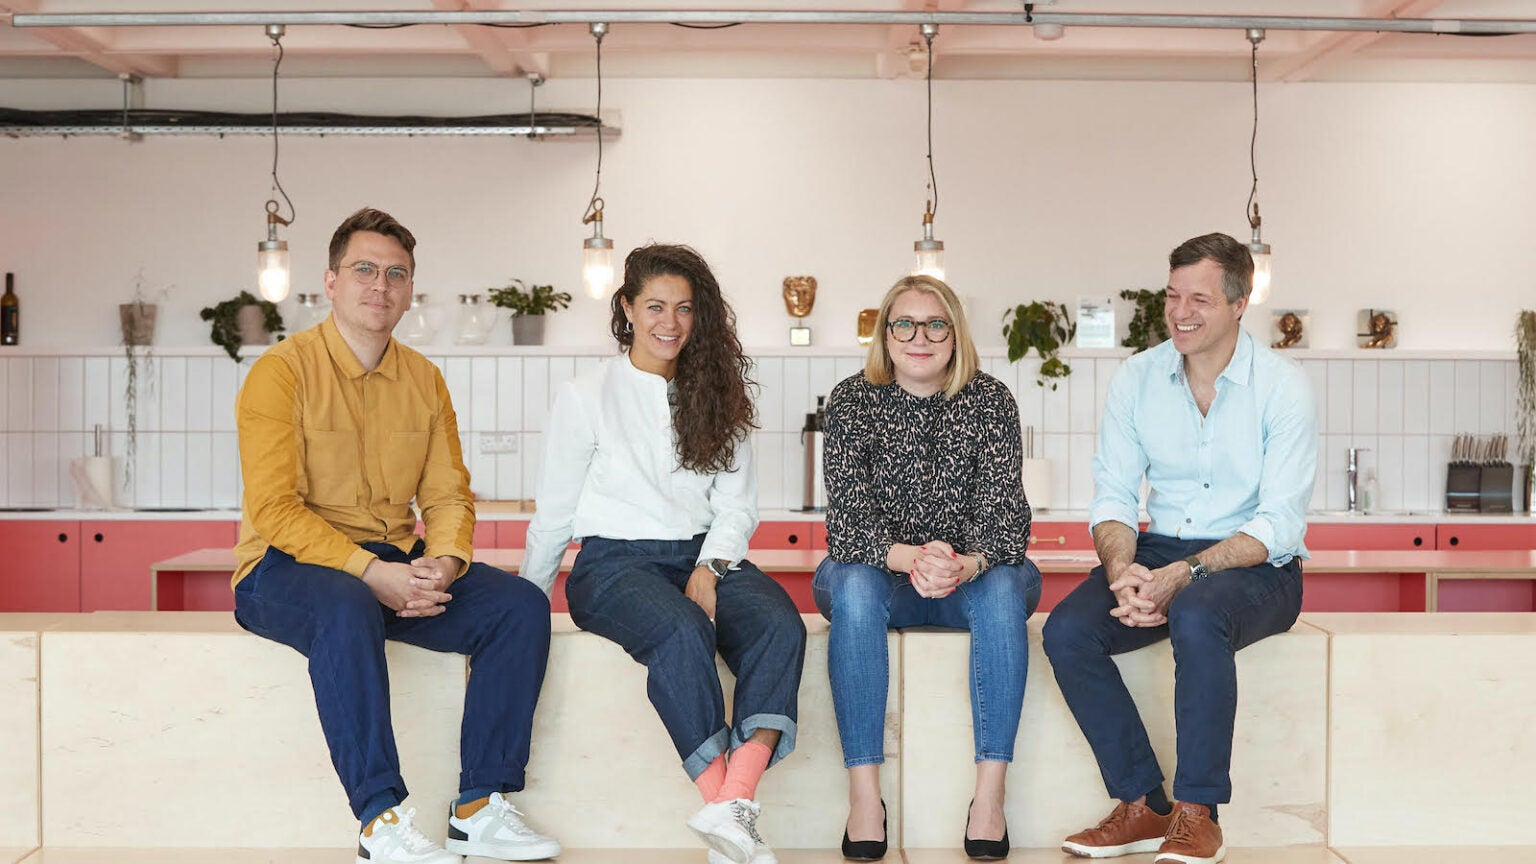 Press Release: Little Dot Studios launches Consumer Brand Division